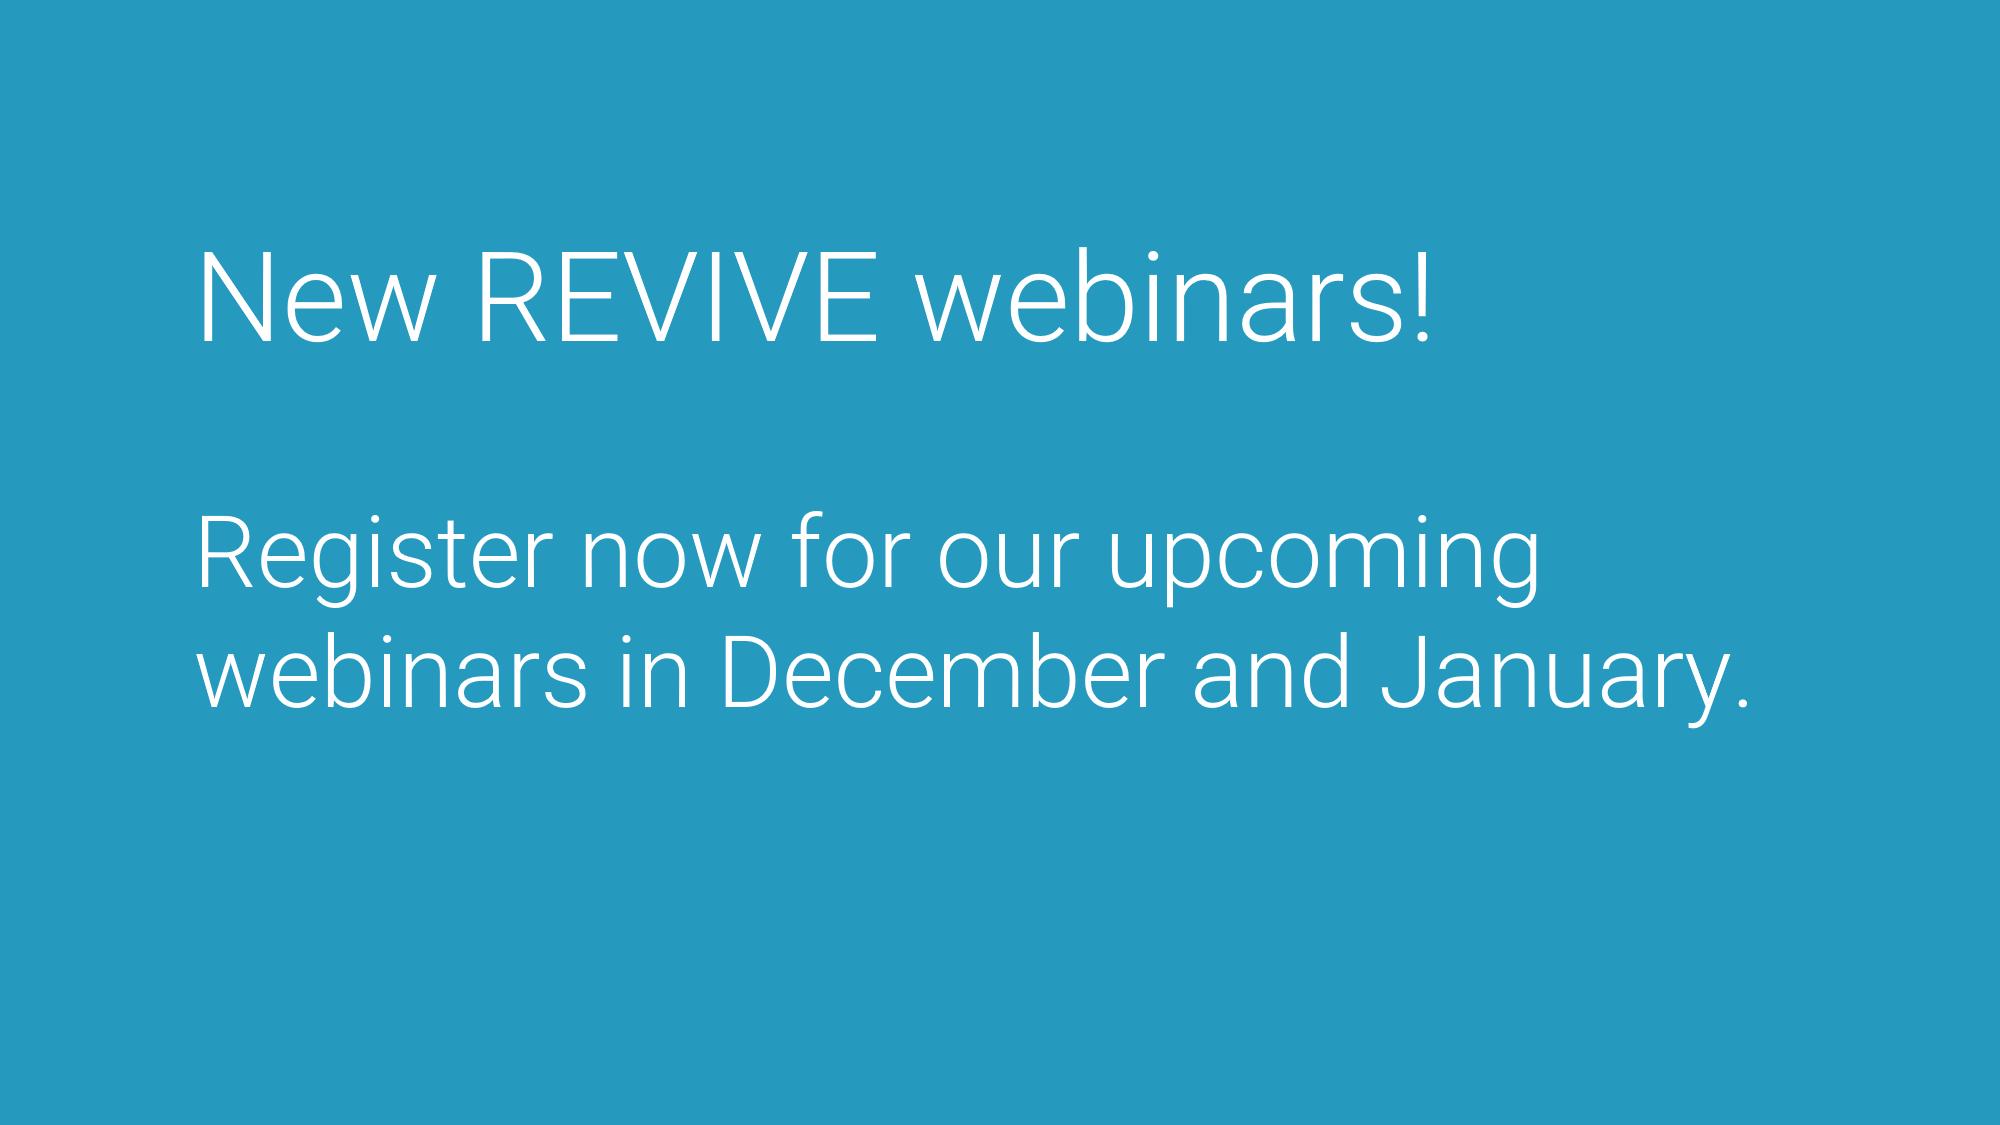 Upcoming REVIVE webinars